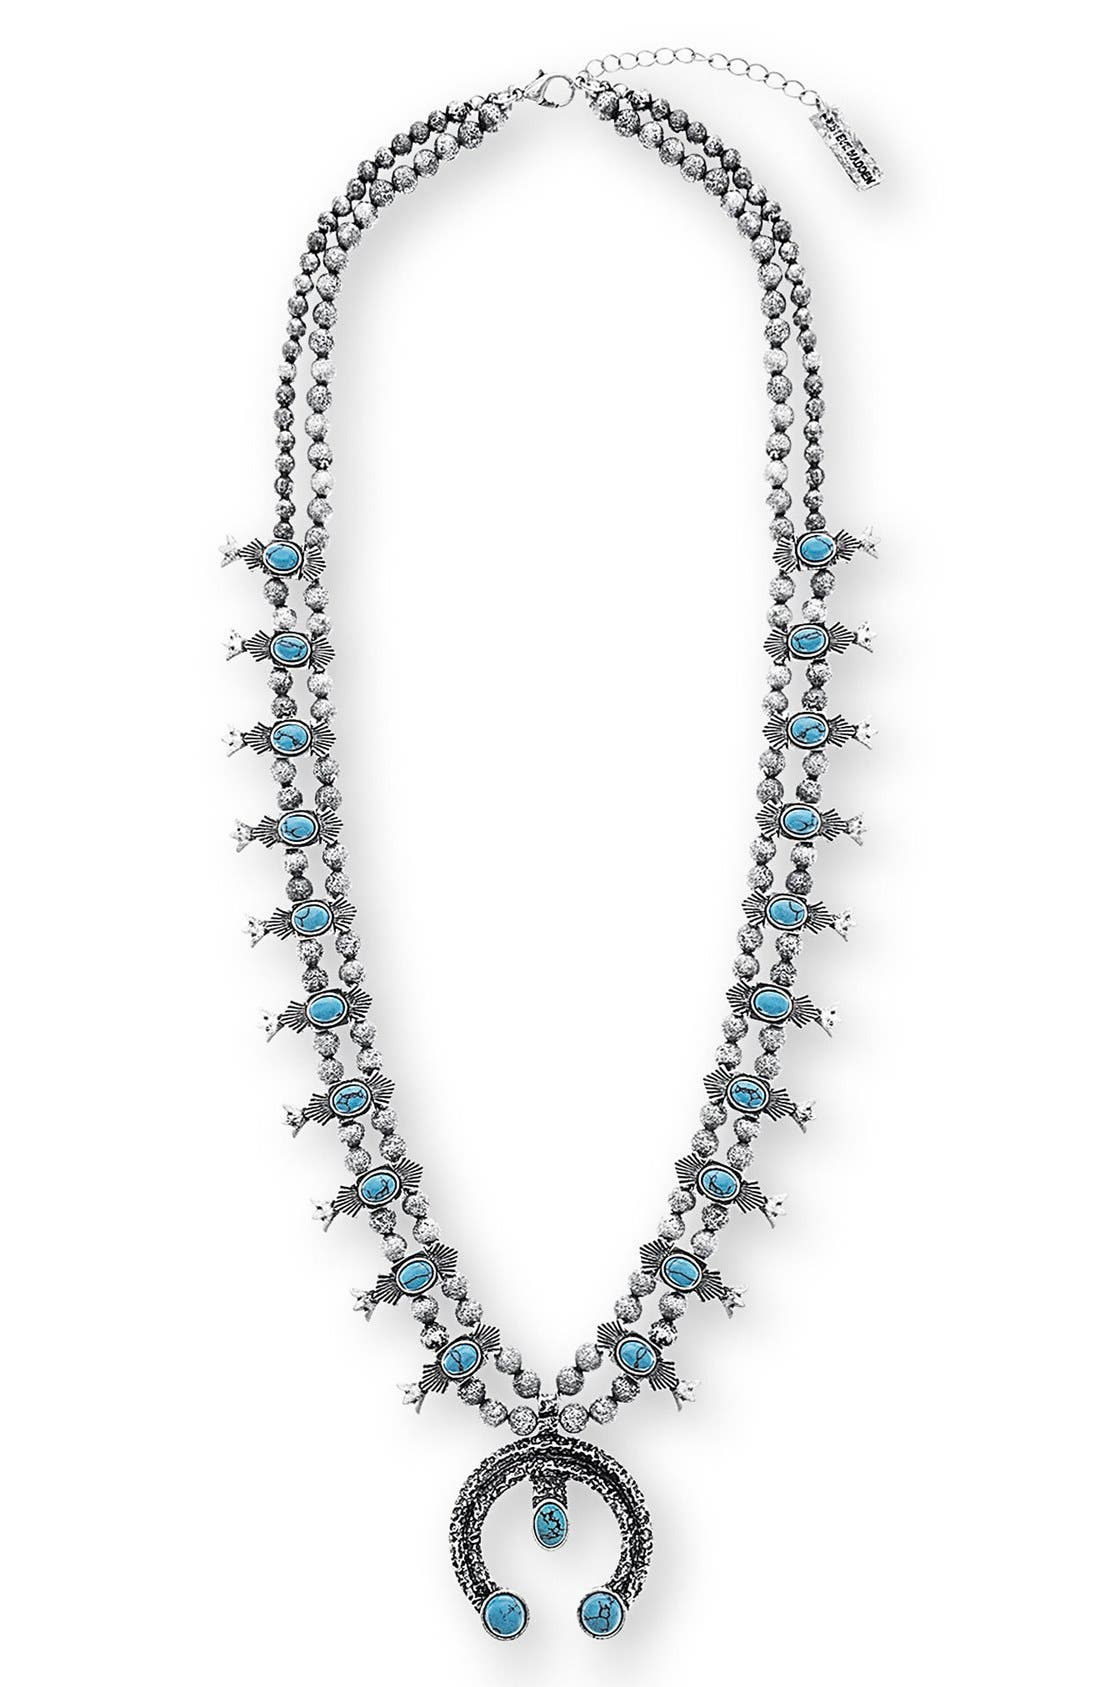 Alternate Image 1 Selected - Steve Madden Squash Blossom Pendant Necklace